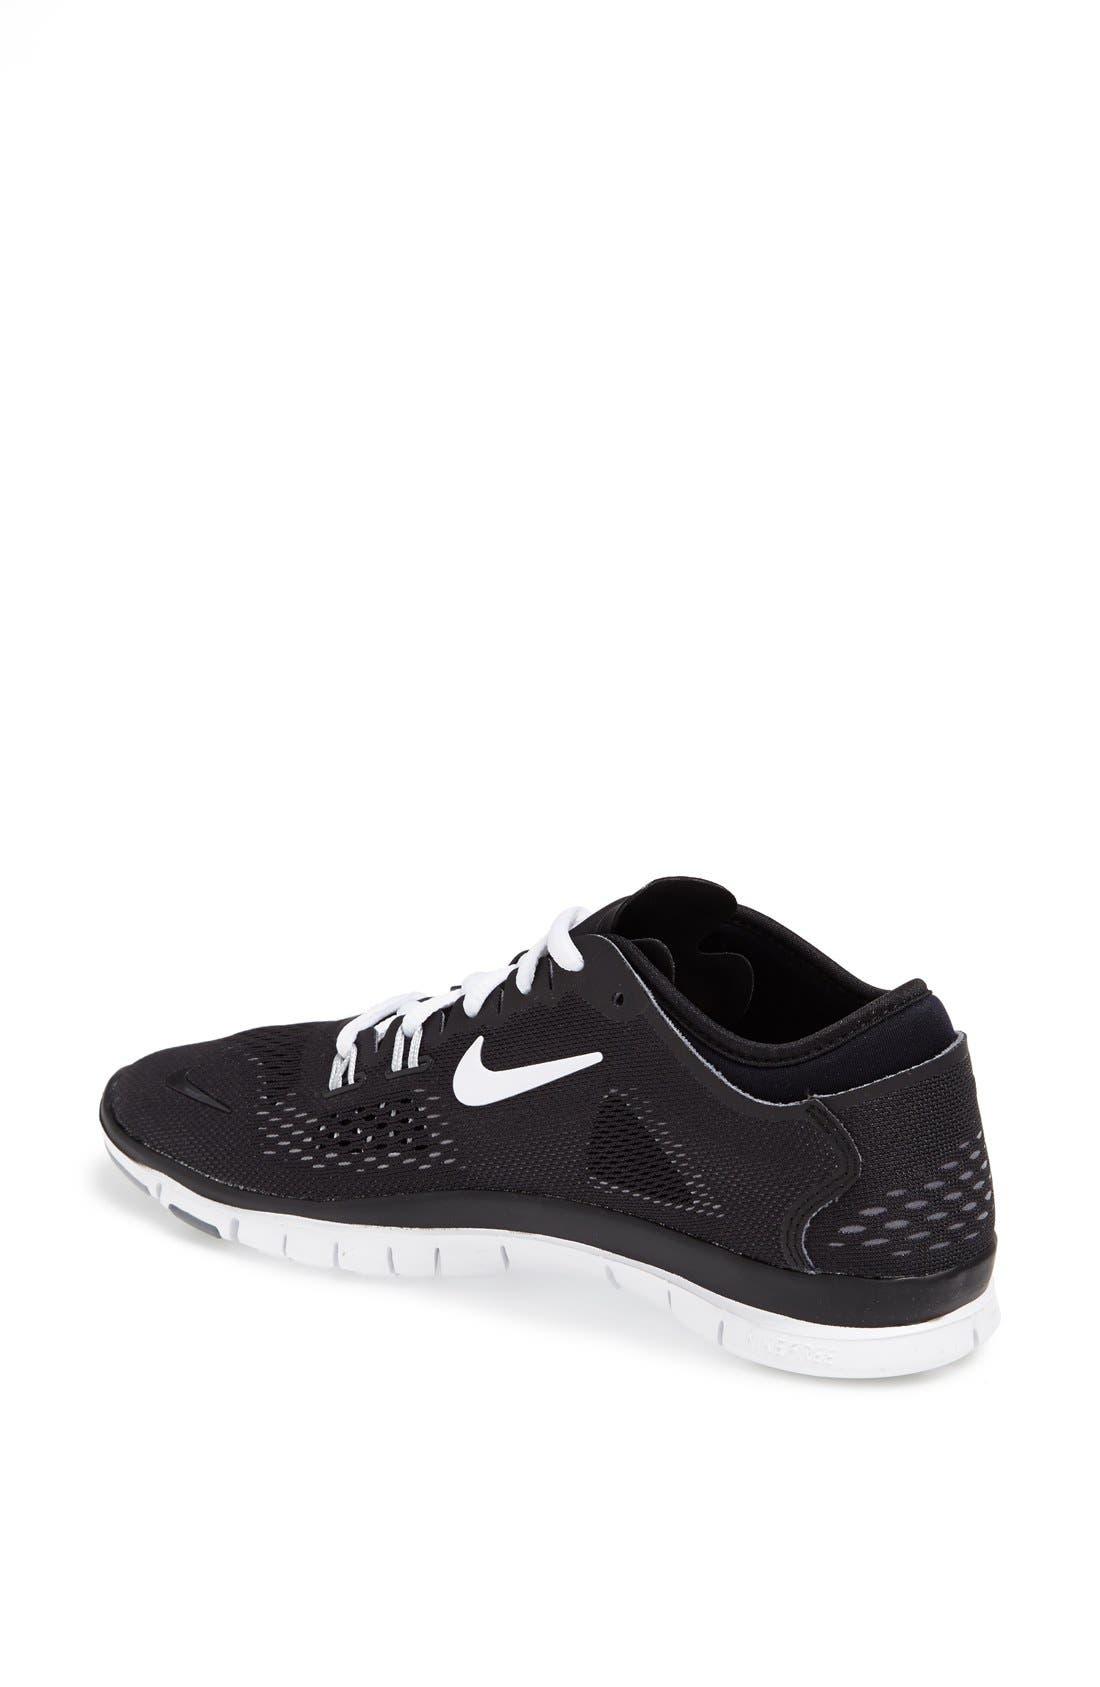 Alternate Image 2  - Nike 'Free 5.0 TR Fit 4' Training Shoe (Women)